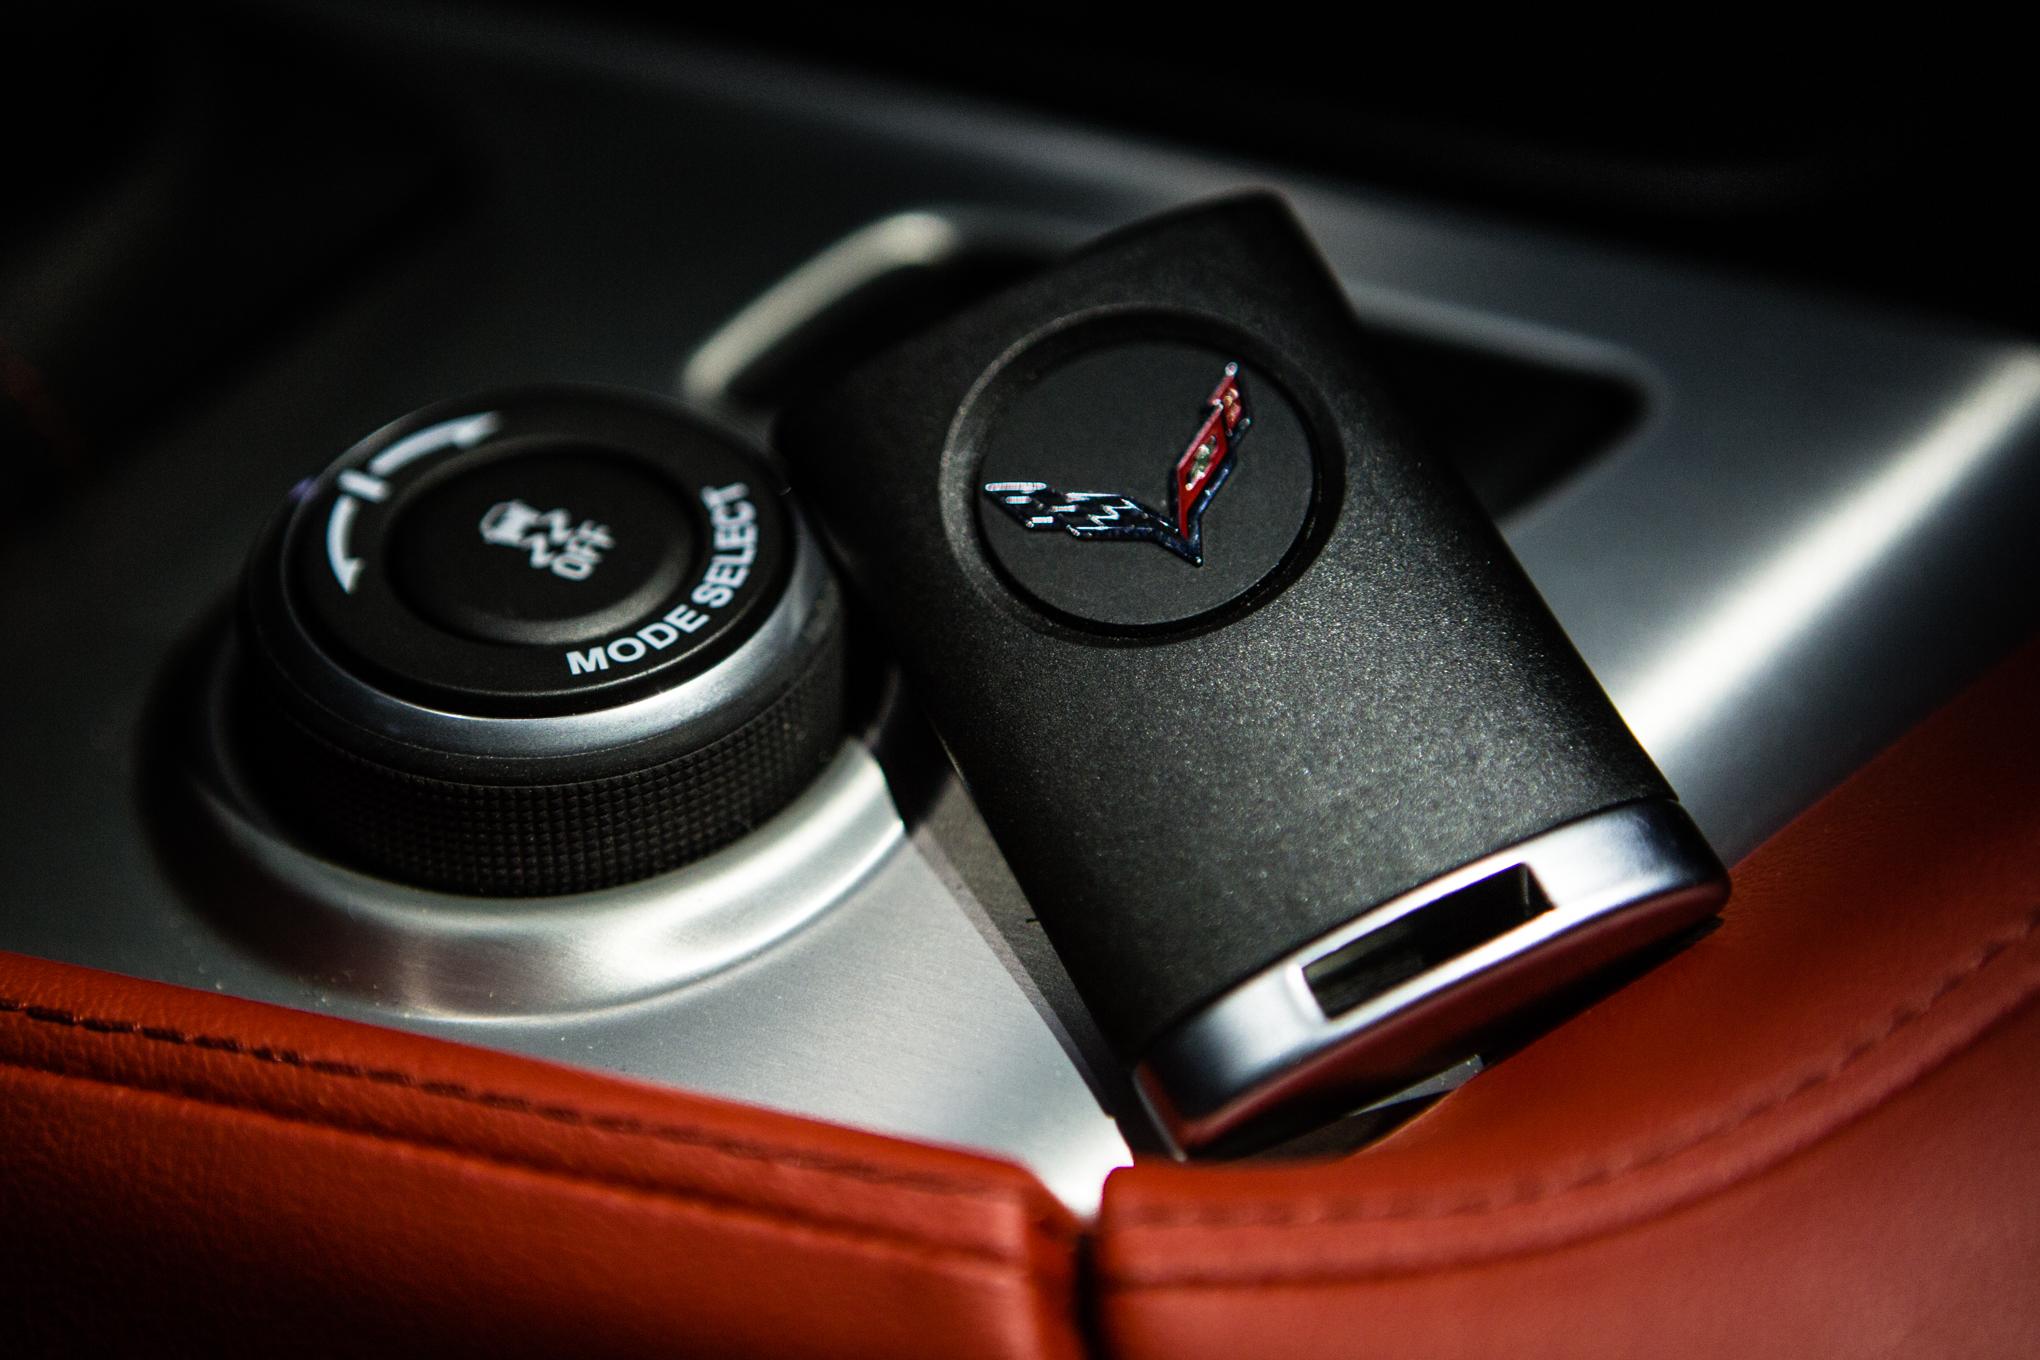 2014 Chevrolet Corvette Stingray Z51 Coupe key fob